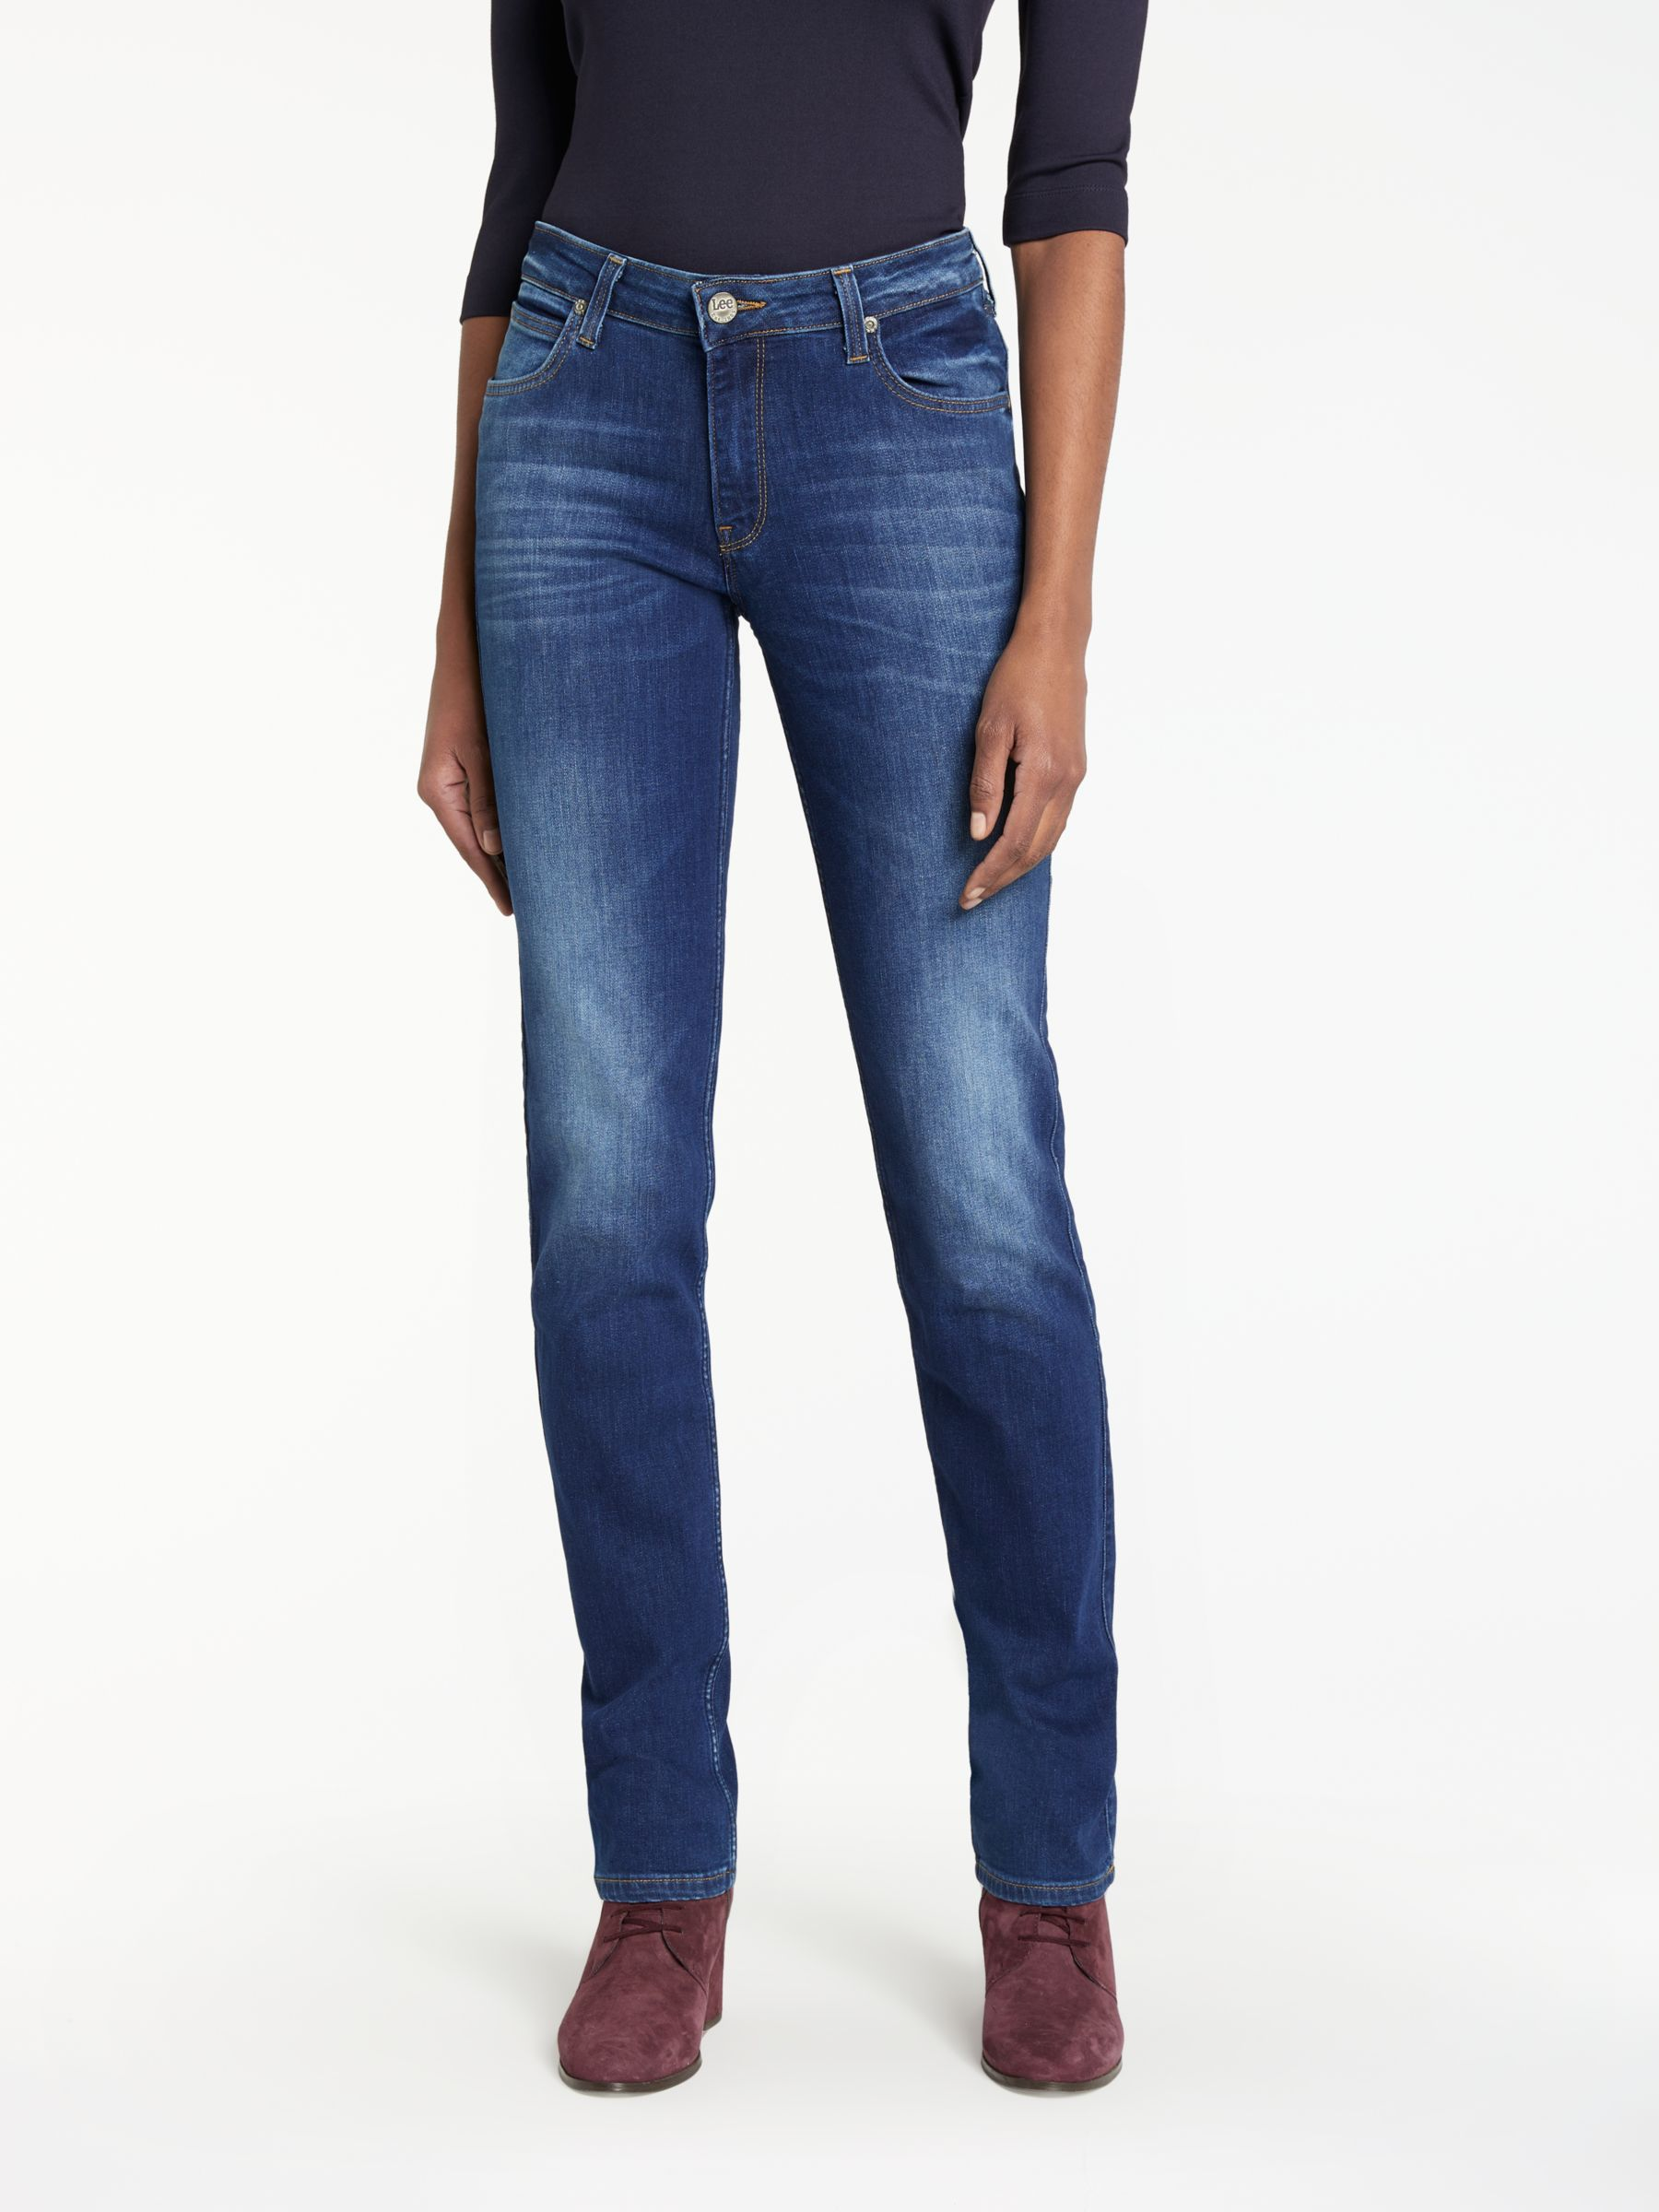 Lee Lee Marion Regular Straight Leg Jeans